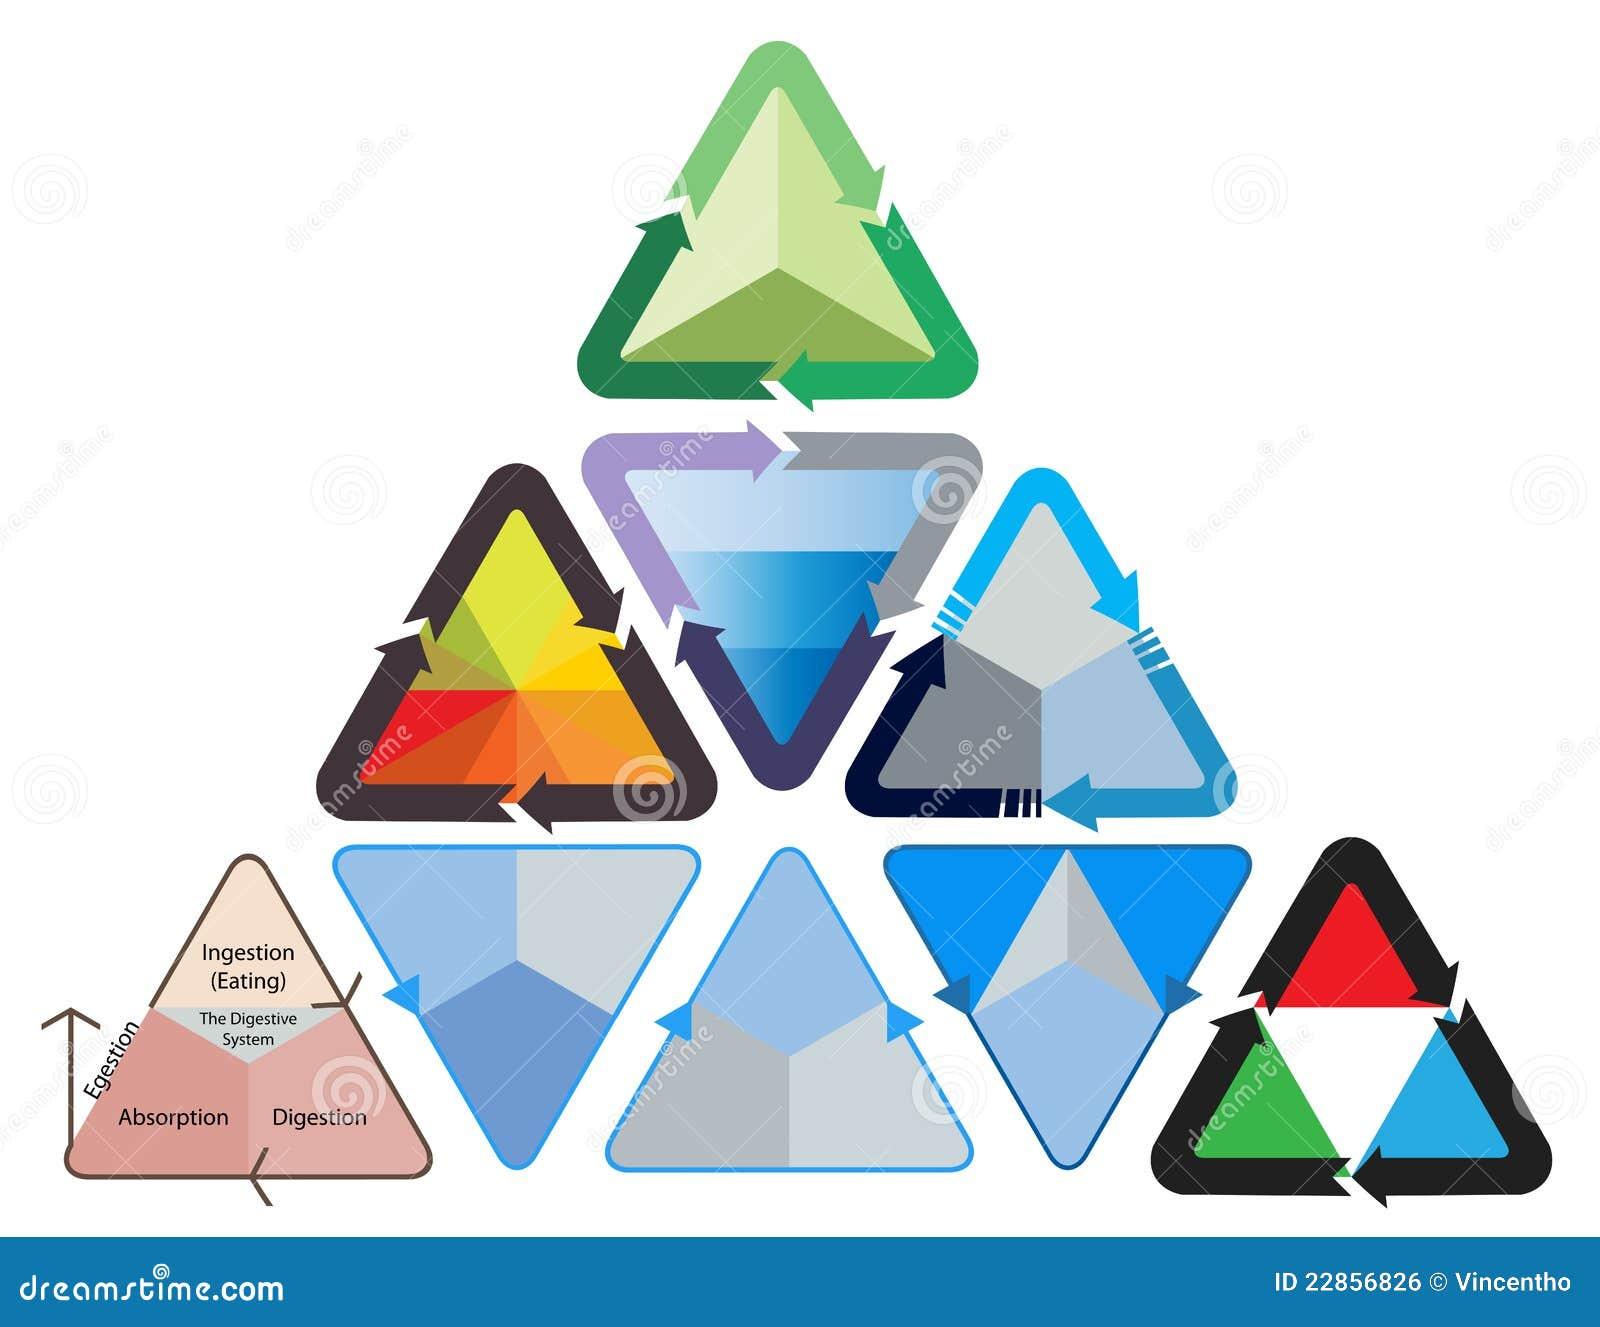 triangular triangle flowchart diagram illustration royalty free    triangular triangle flowchart diagram illustration